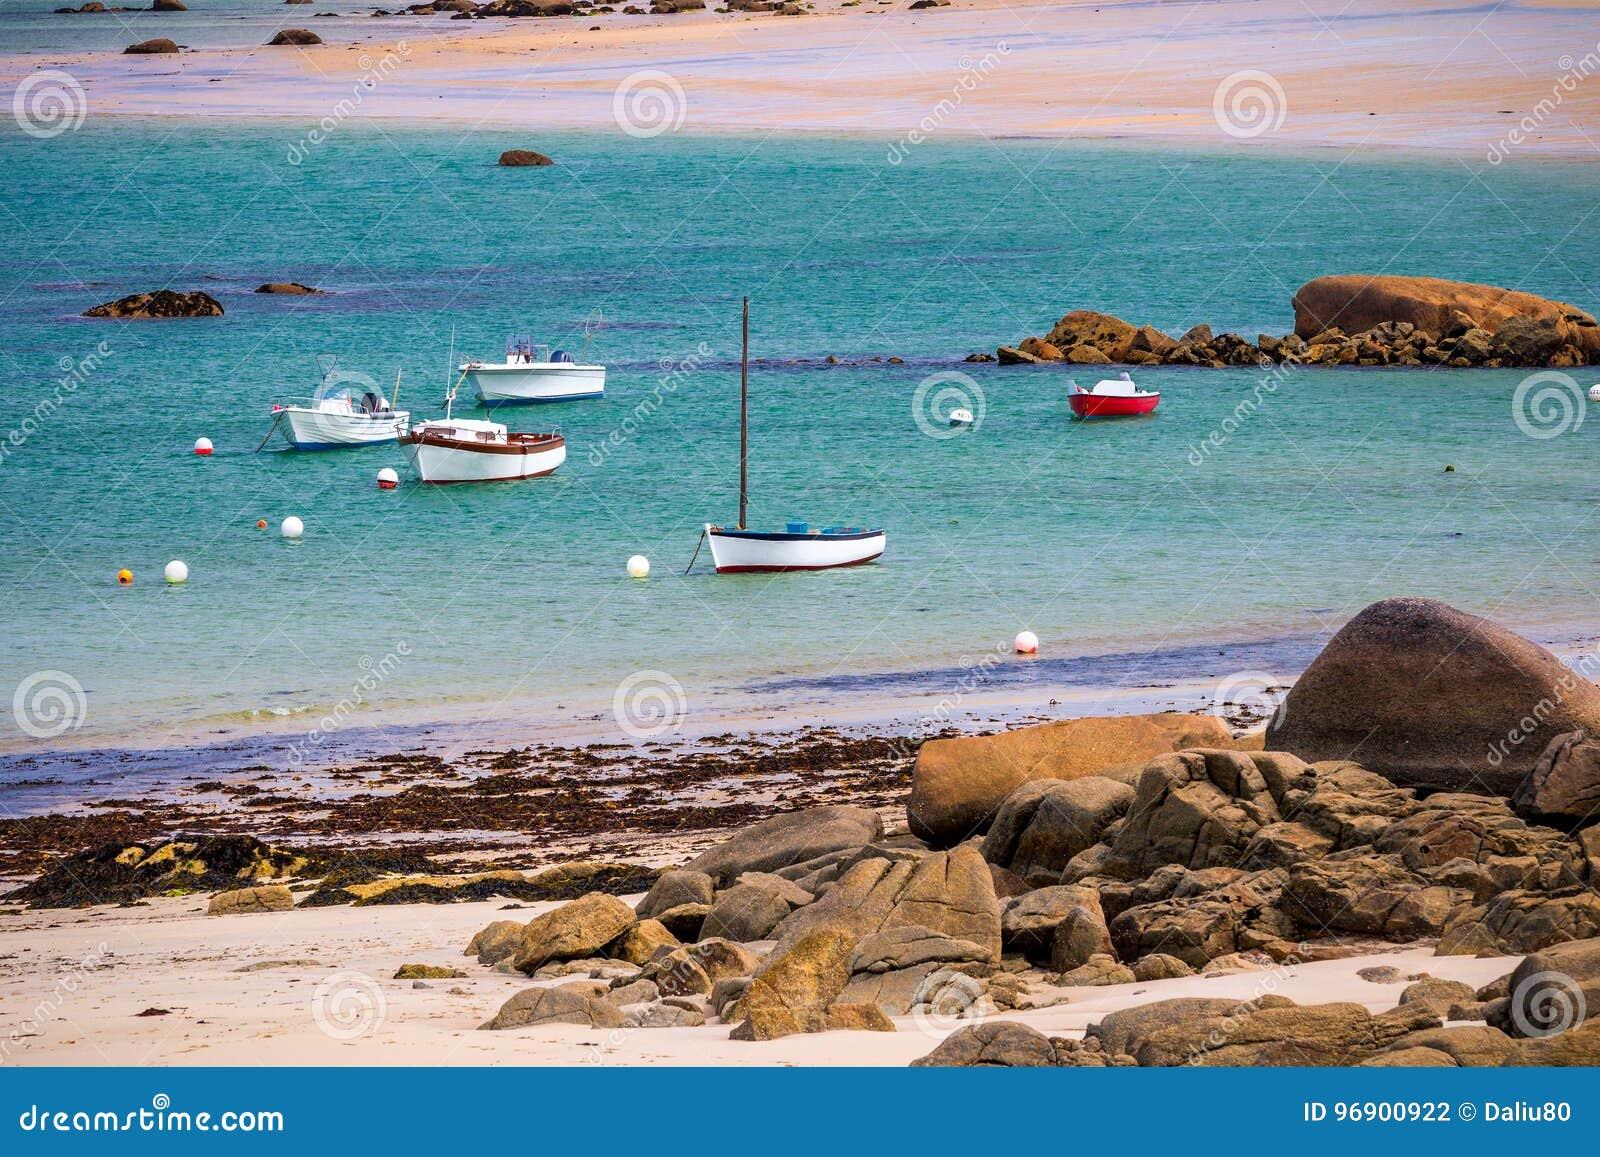 Fartyg i porten på den rosa graniten seglar utmed kusten (skjul de granit ros